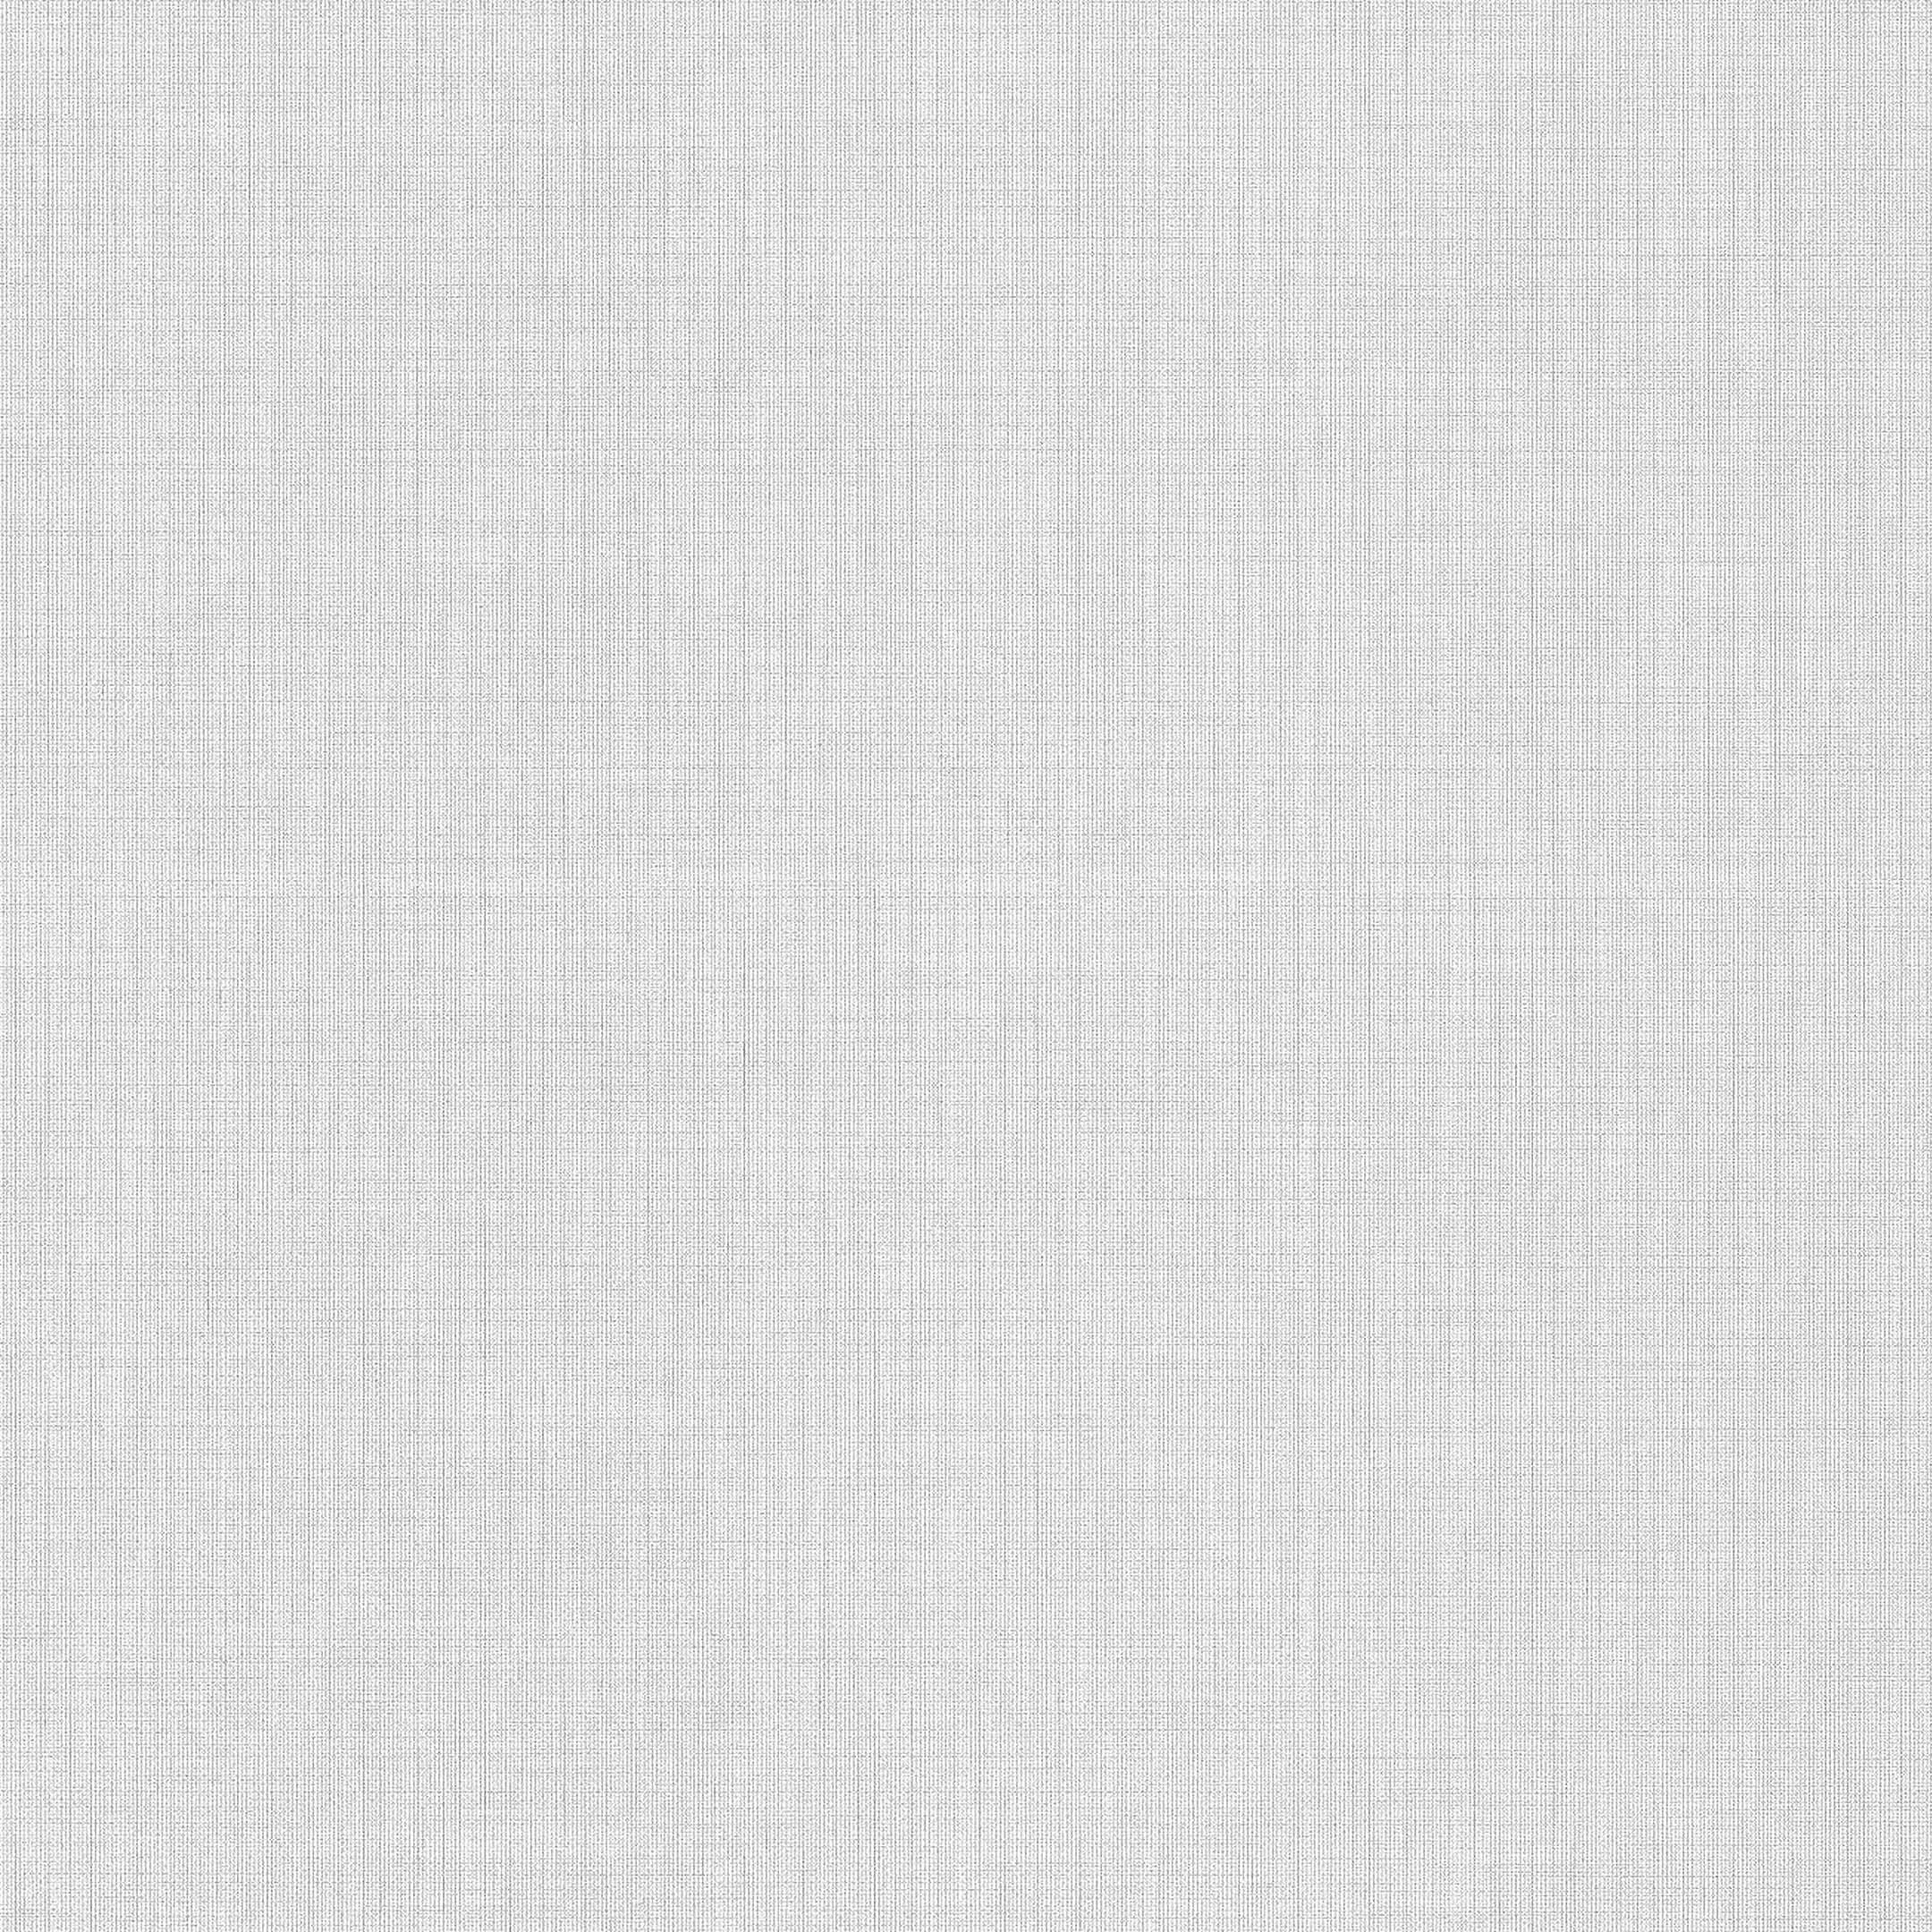 Обои виниловые на флизелиновой основе MaxWall Vila Rosa 159020-00 (1,06х10 м) r1 221 обои loymina rosa dragomirski